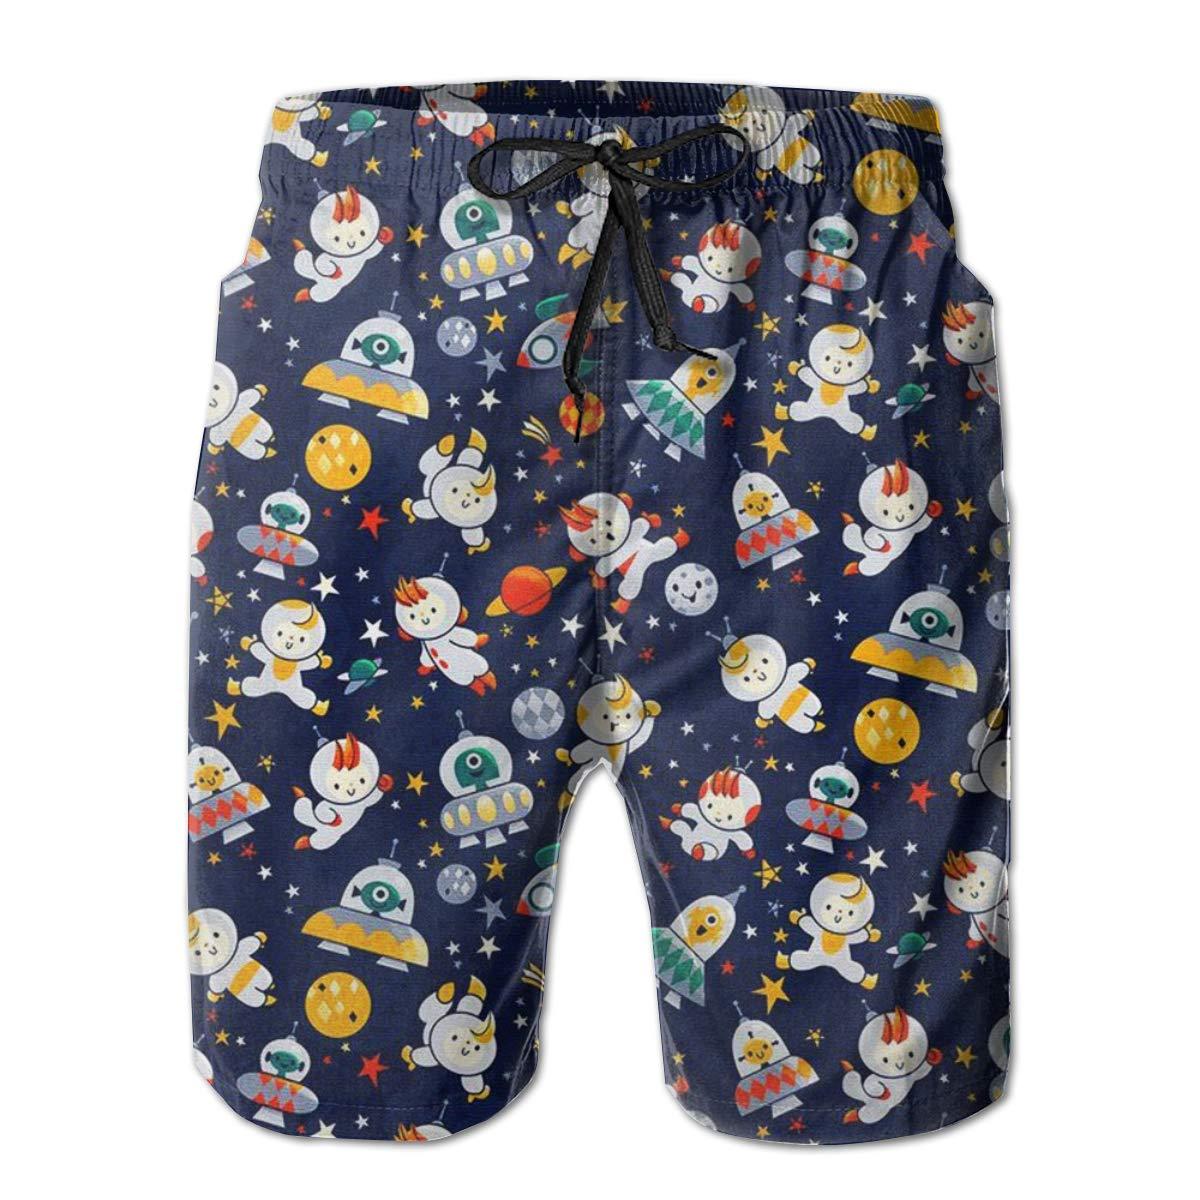 RADCRAVEN Mens Swim Trunks Cute Astronaut Beach Shorts Quick Dry Mesh Lining Board Shorts Swimwear with Pockets